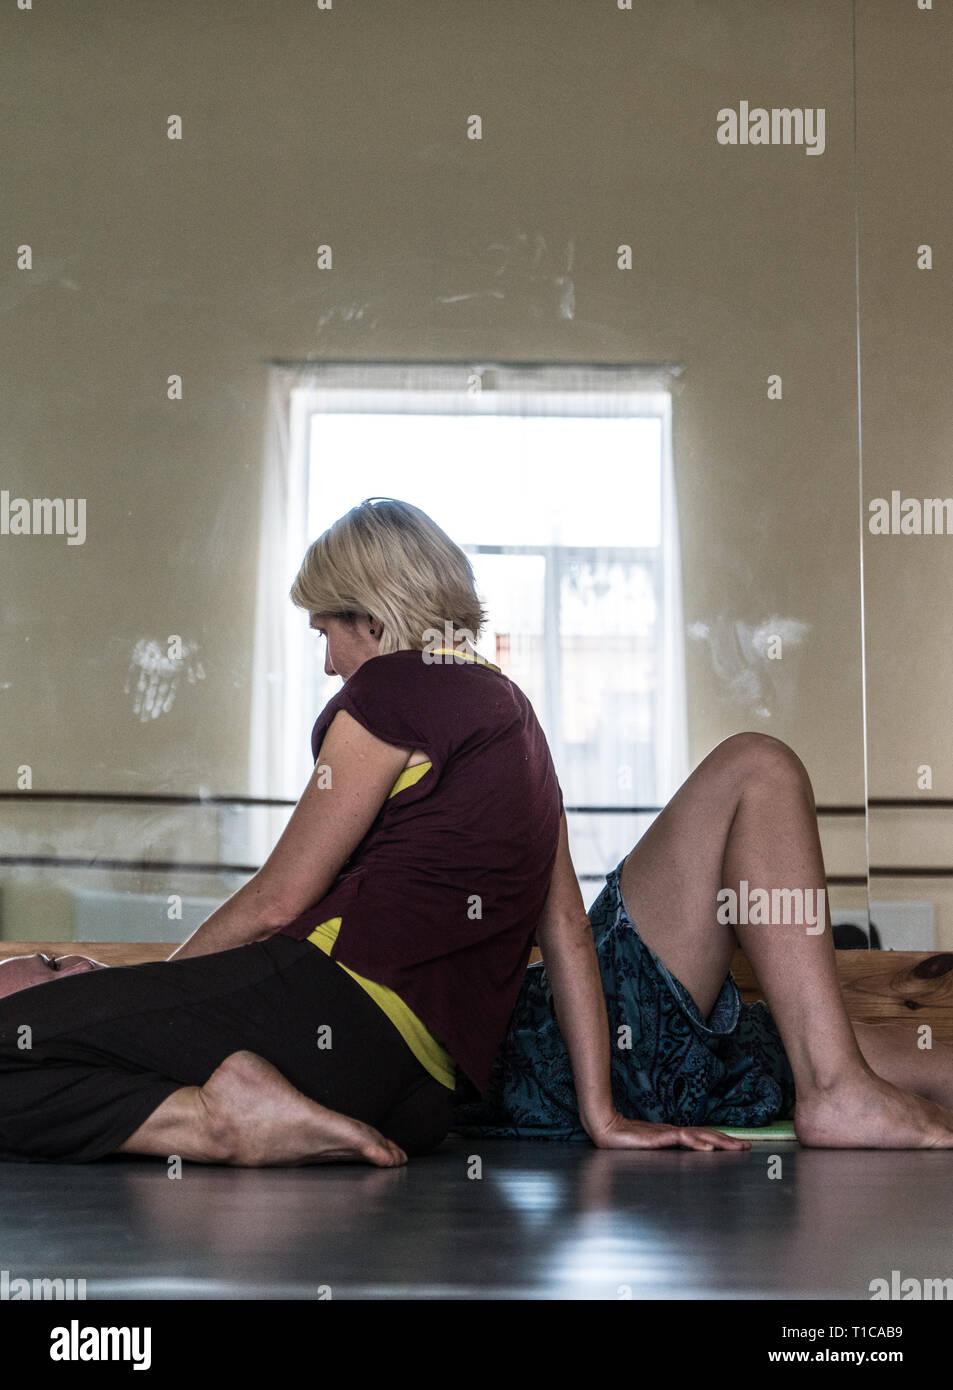 Somatic, bodywork, massage, somatic therapy, dance movement therapy, BMC, Feldenkrais method, freedom dance, ecstatic, free dance, Ci, touch - Stock Image